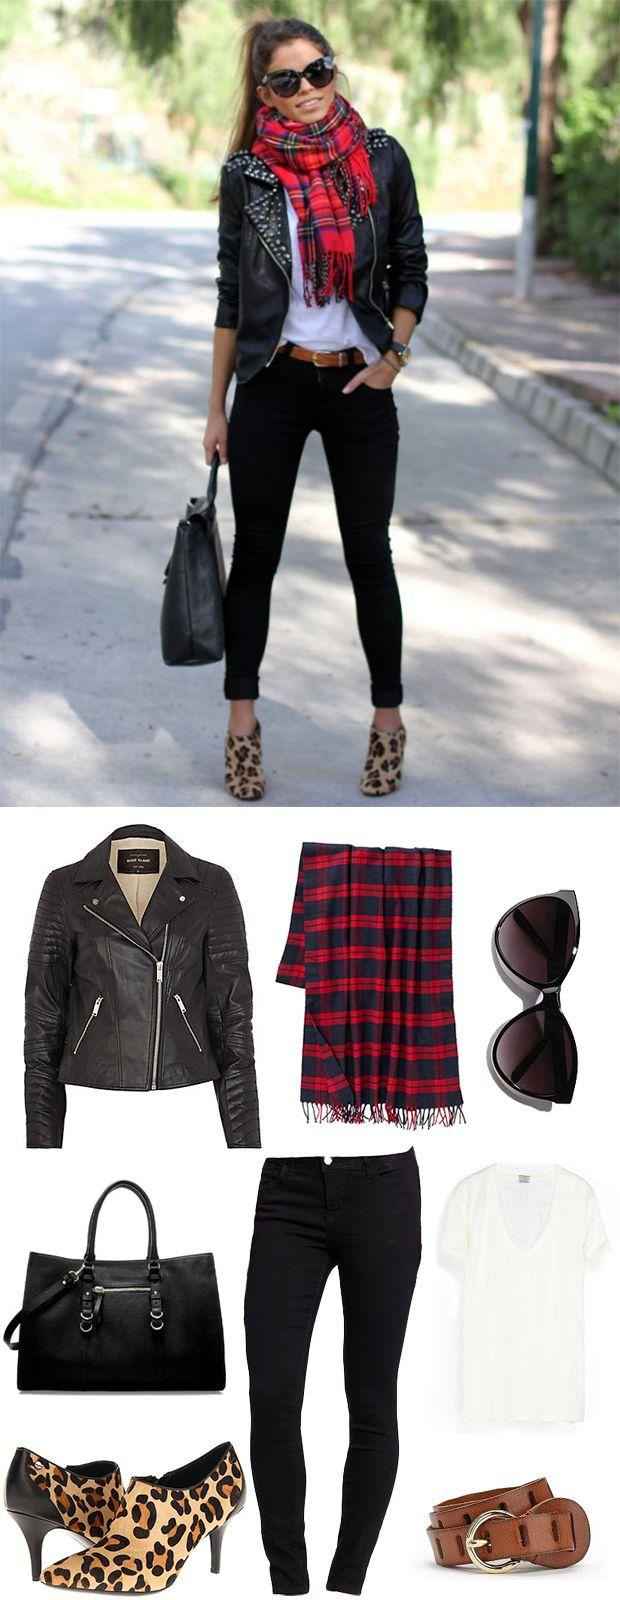 Cool weather dressing: Street Style Inspiration: tartan plaid + leopard + leather biker jacket